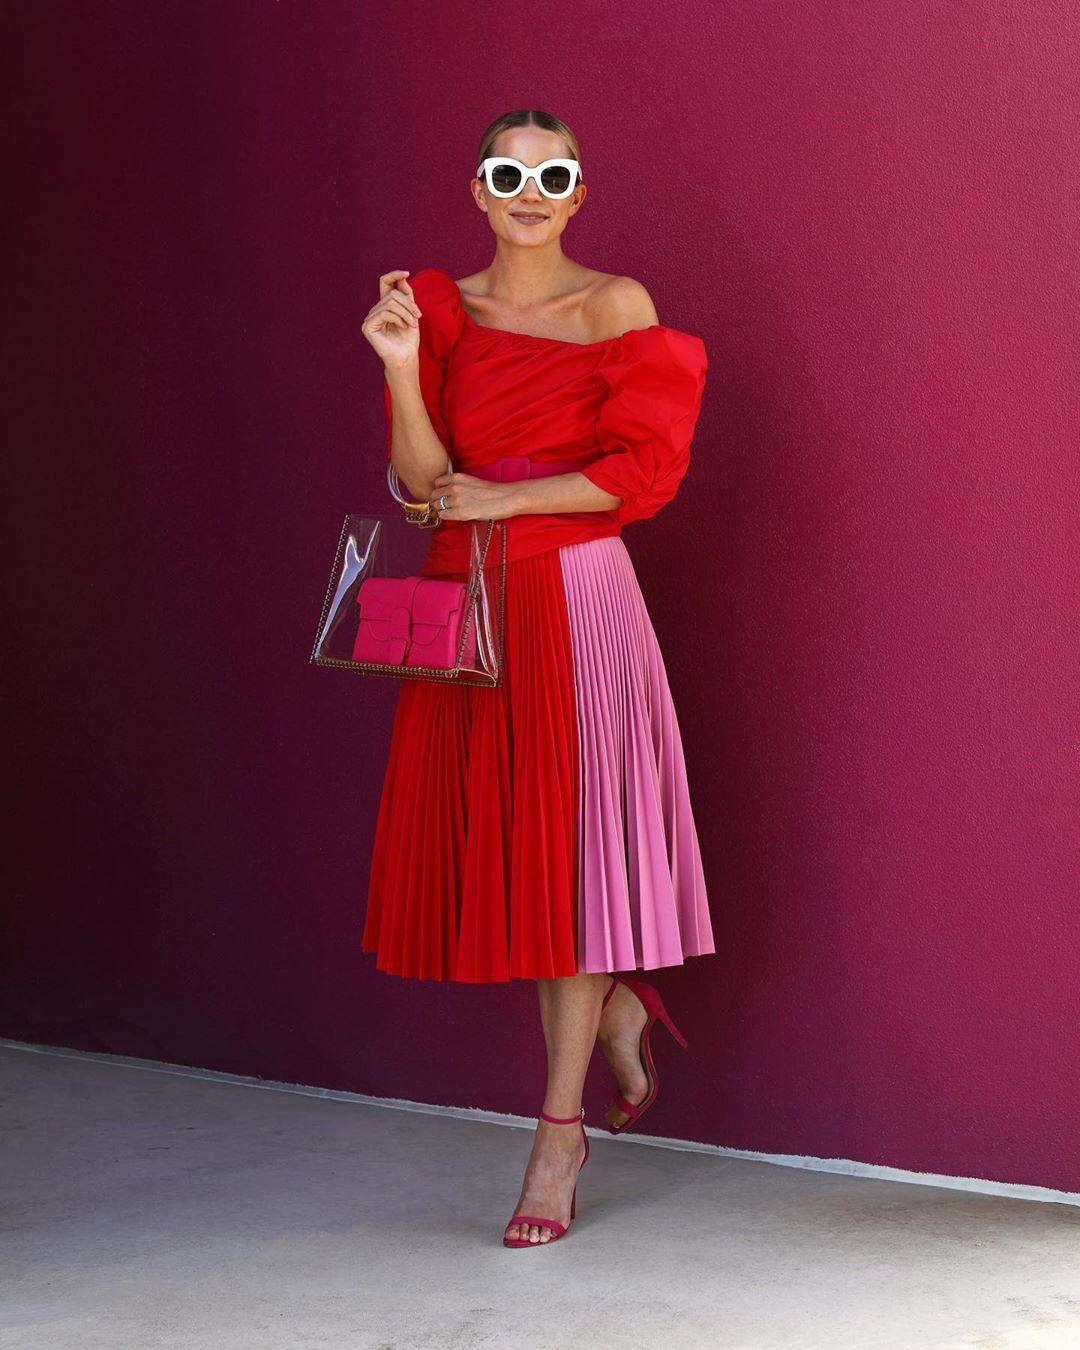 skirt pleated skirt midi skirt calvin klein red top off the shoulder top sandals transparent  bag